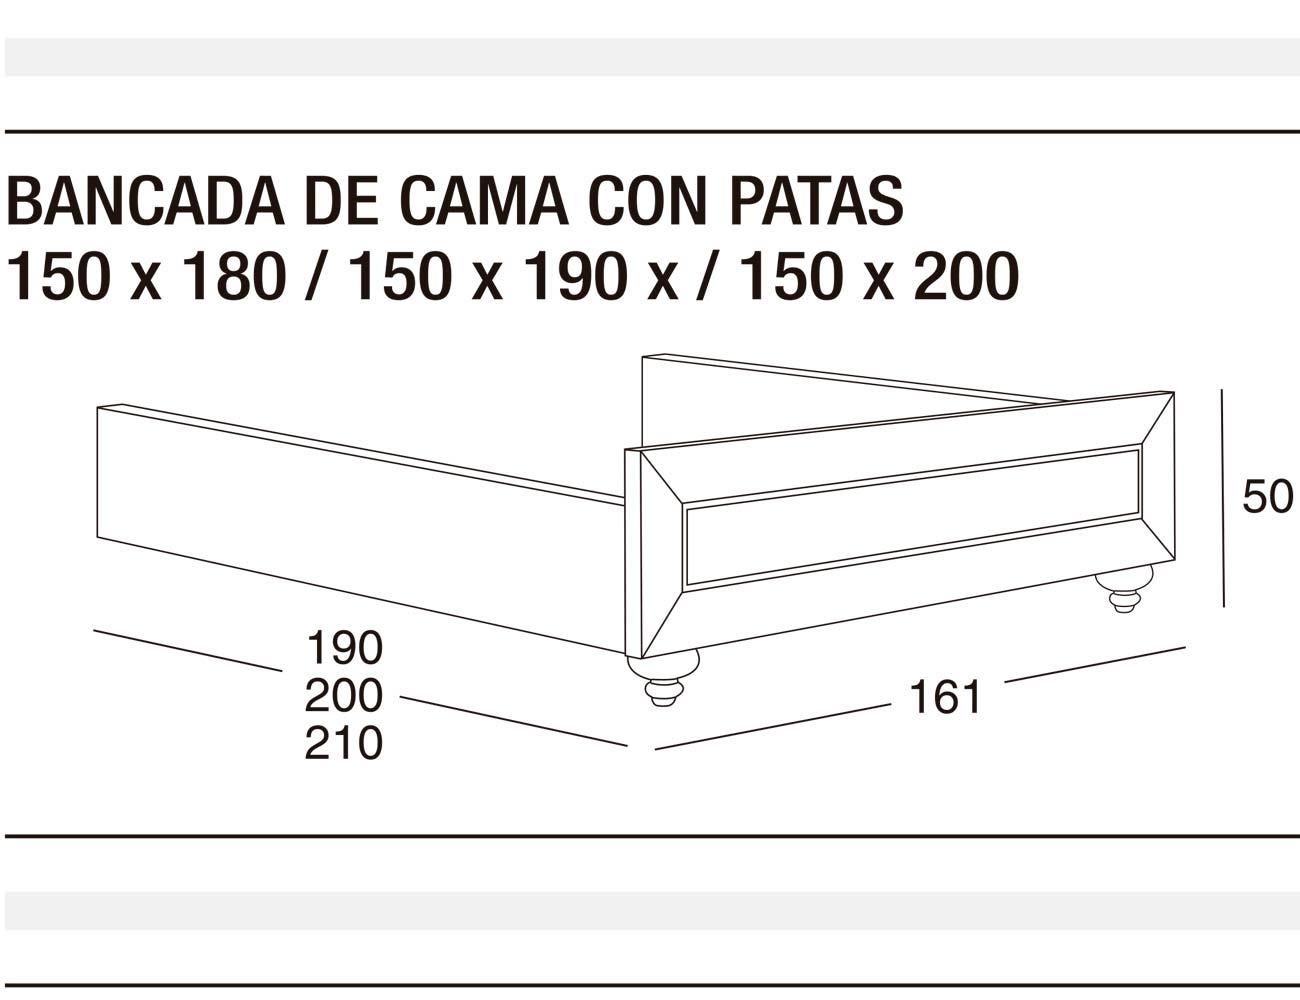 Bancada cama p 150x180 150x190 150x2002